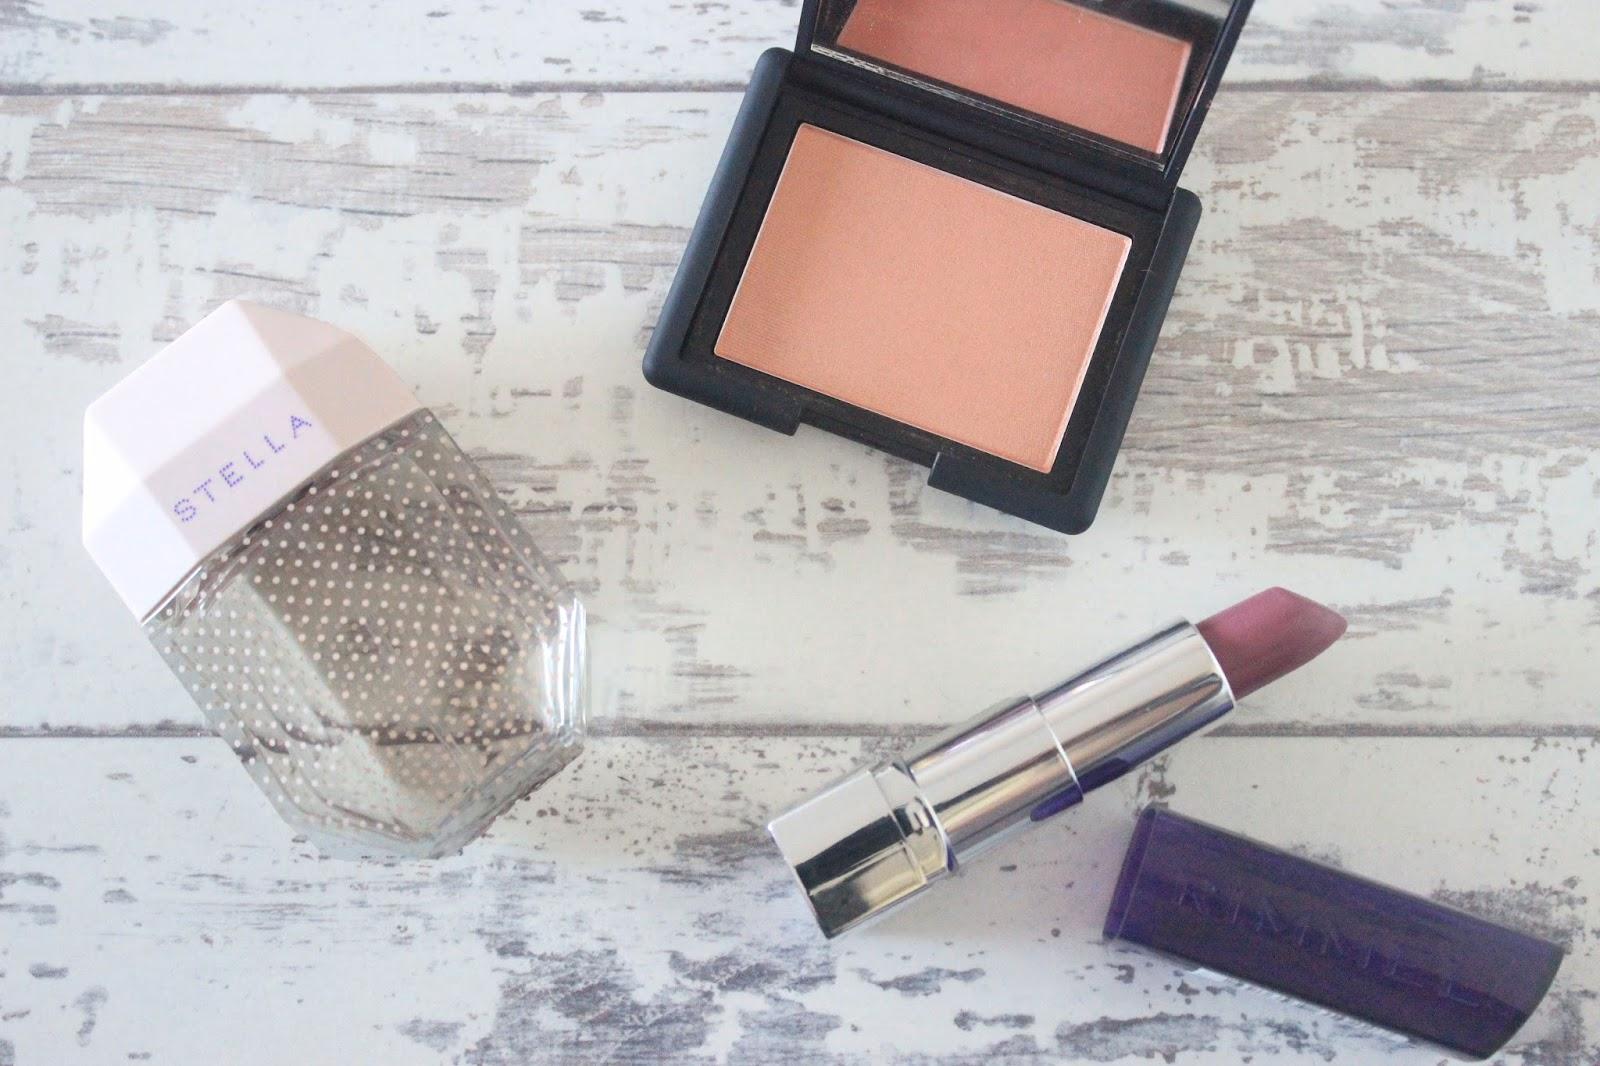 Stella McCartney EDT, Nars Luster, Rimmel Lipstick Vintage Pink